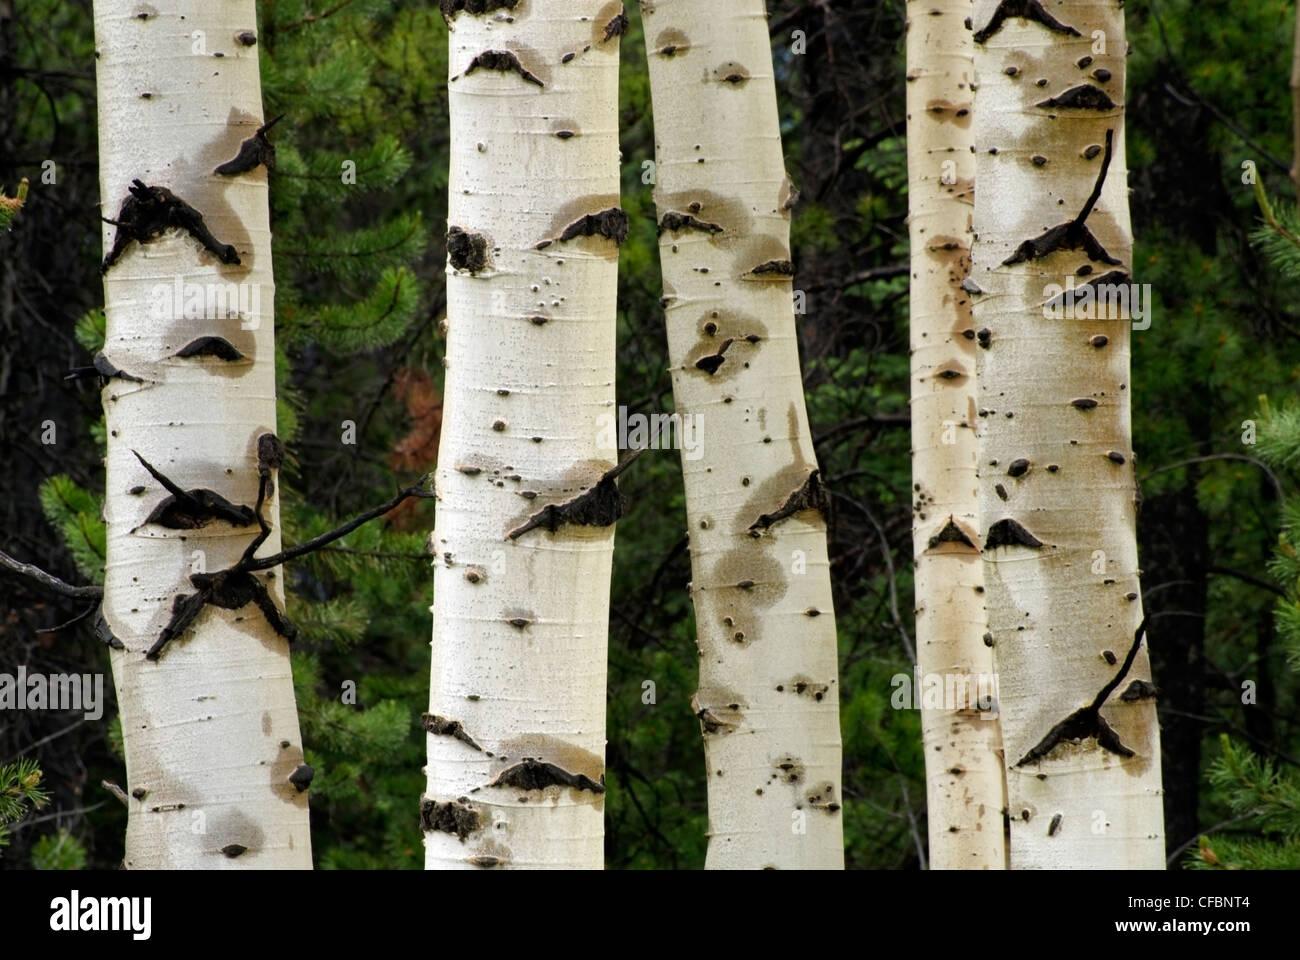 Wet aspen tree trunks (Populous tremuloides) near Nordegg, Alberta, Canada - Stock Image